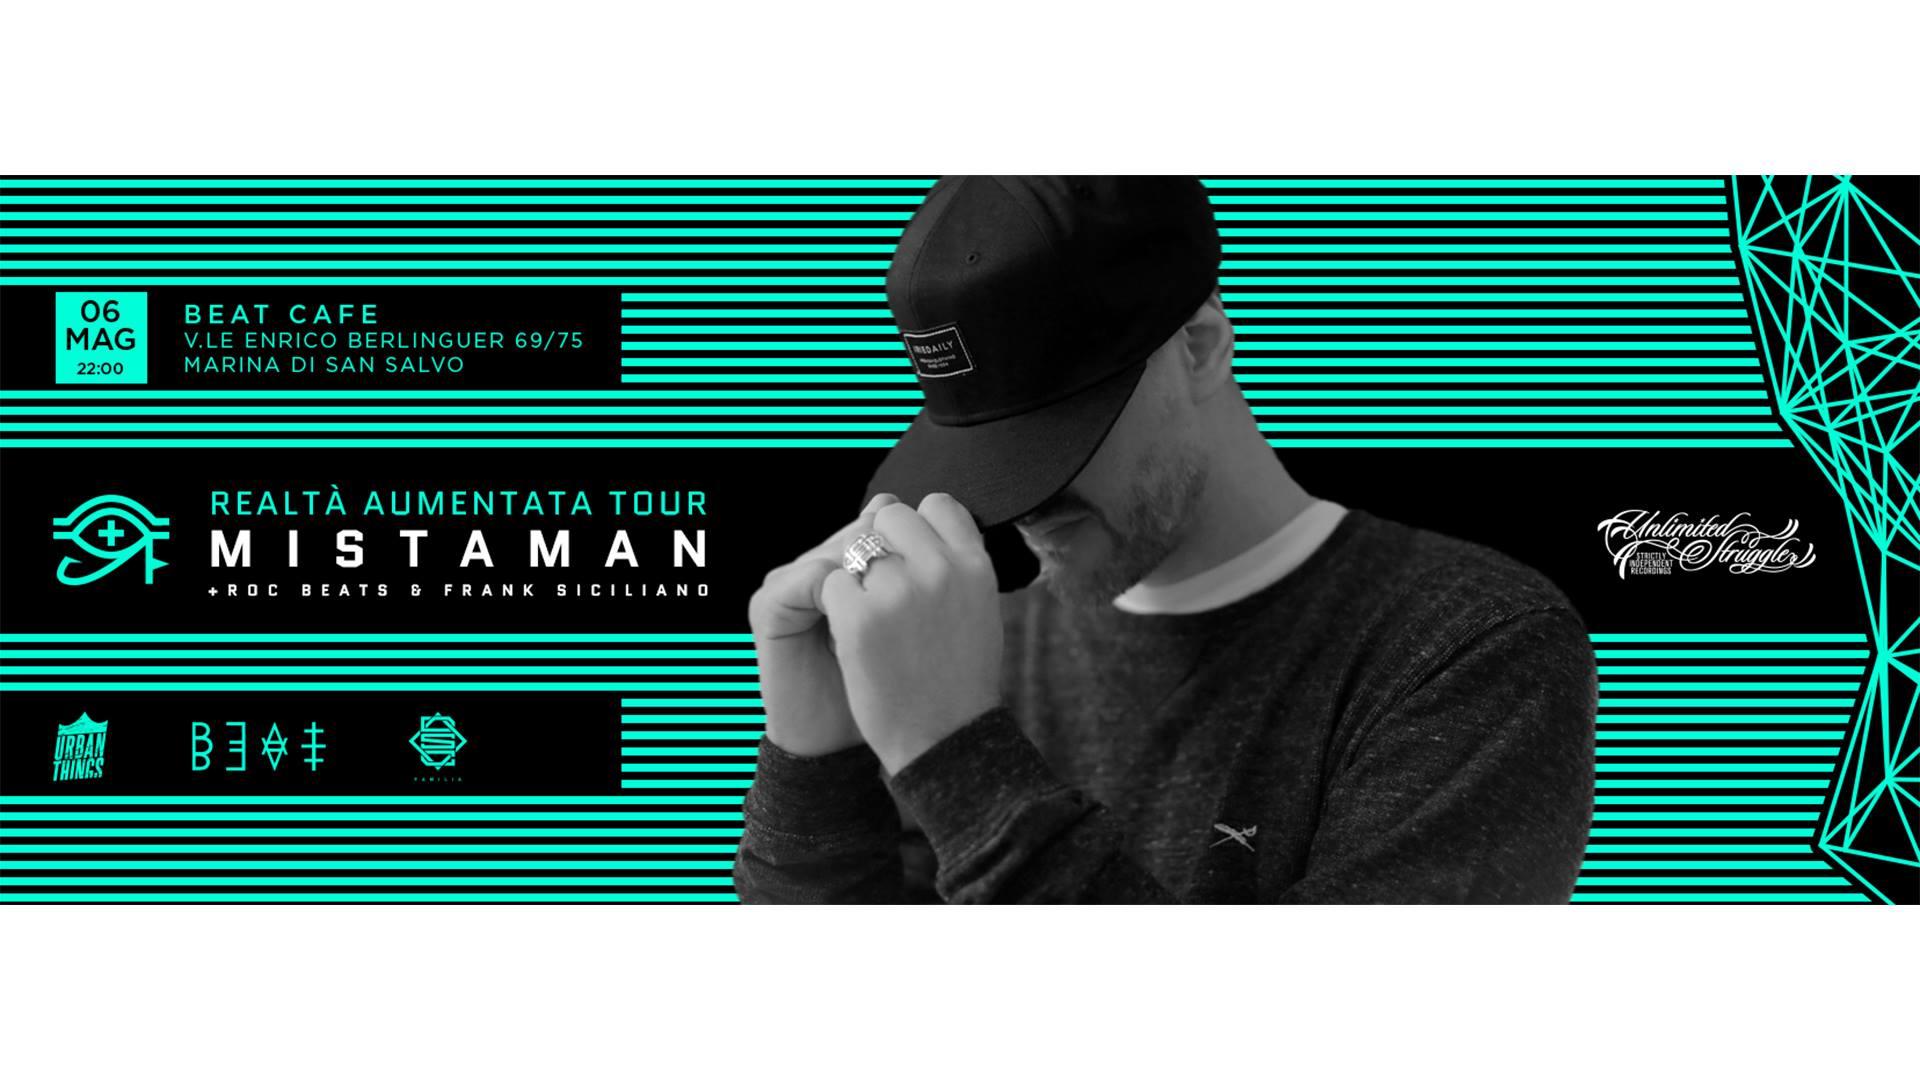 06.05.17 | MISTAMAN + FRANK SICILIANO & ROC BEATS Aka DJ SHOCCA